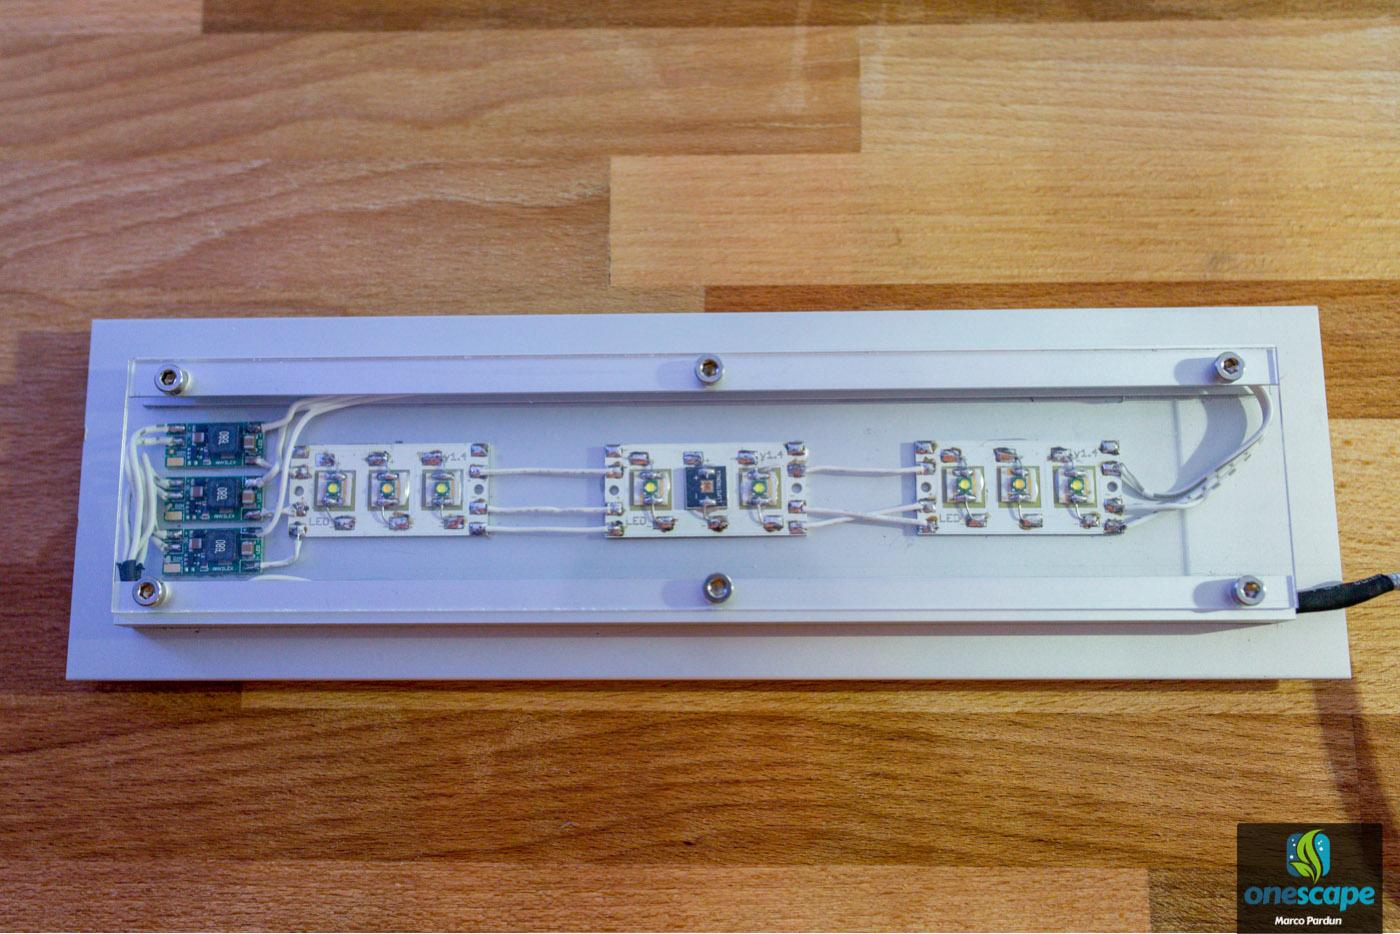 Fabulous DIY) LED-Lampe selber bauen - Aquariumbeleuchtung - Aquascaping Forum QO48